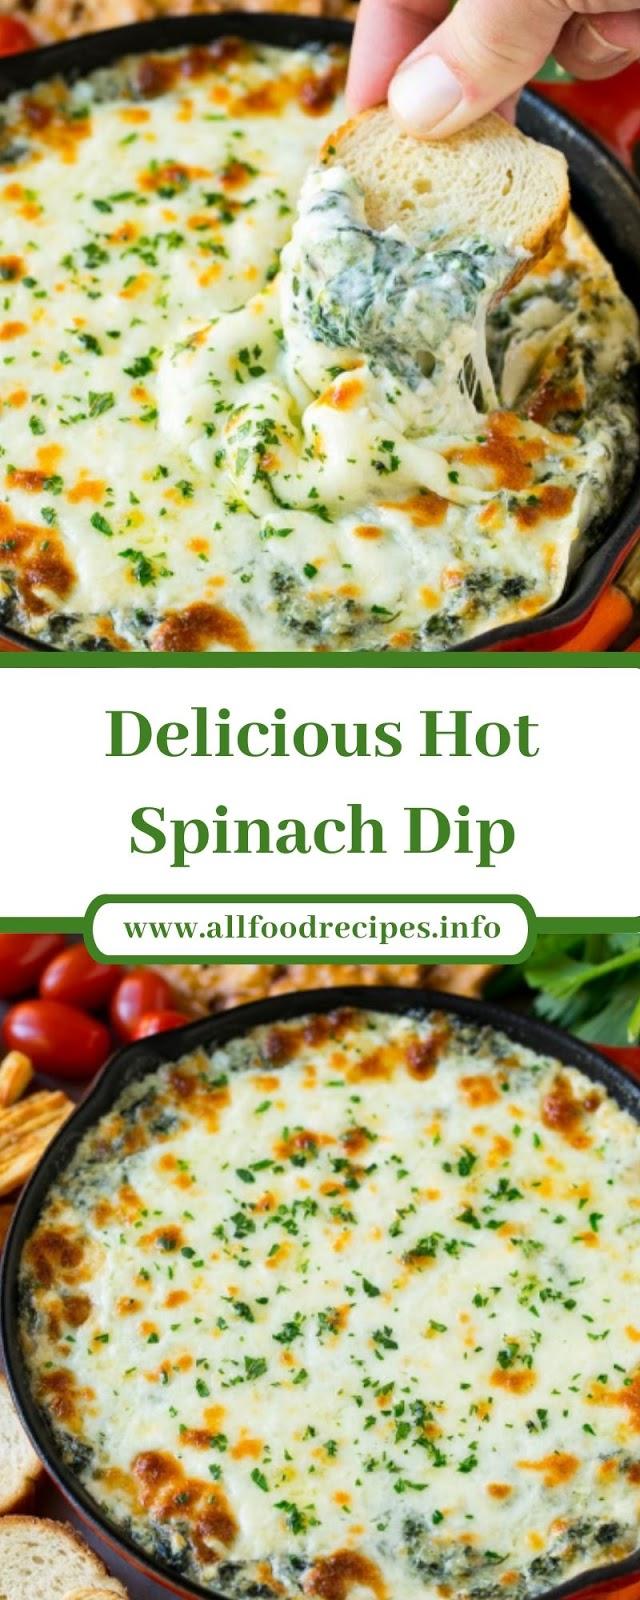 Delicious Hot Spinach Dip